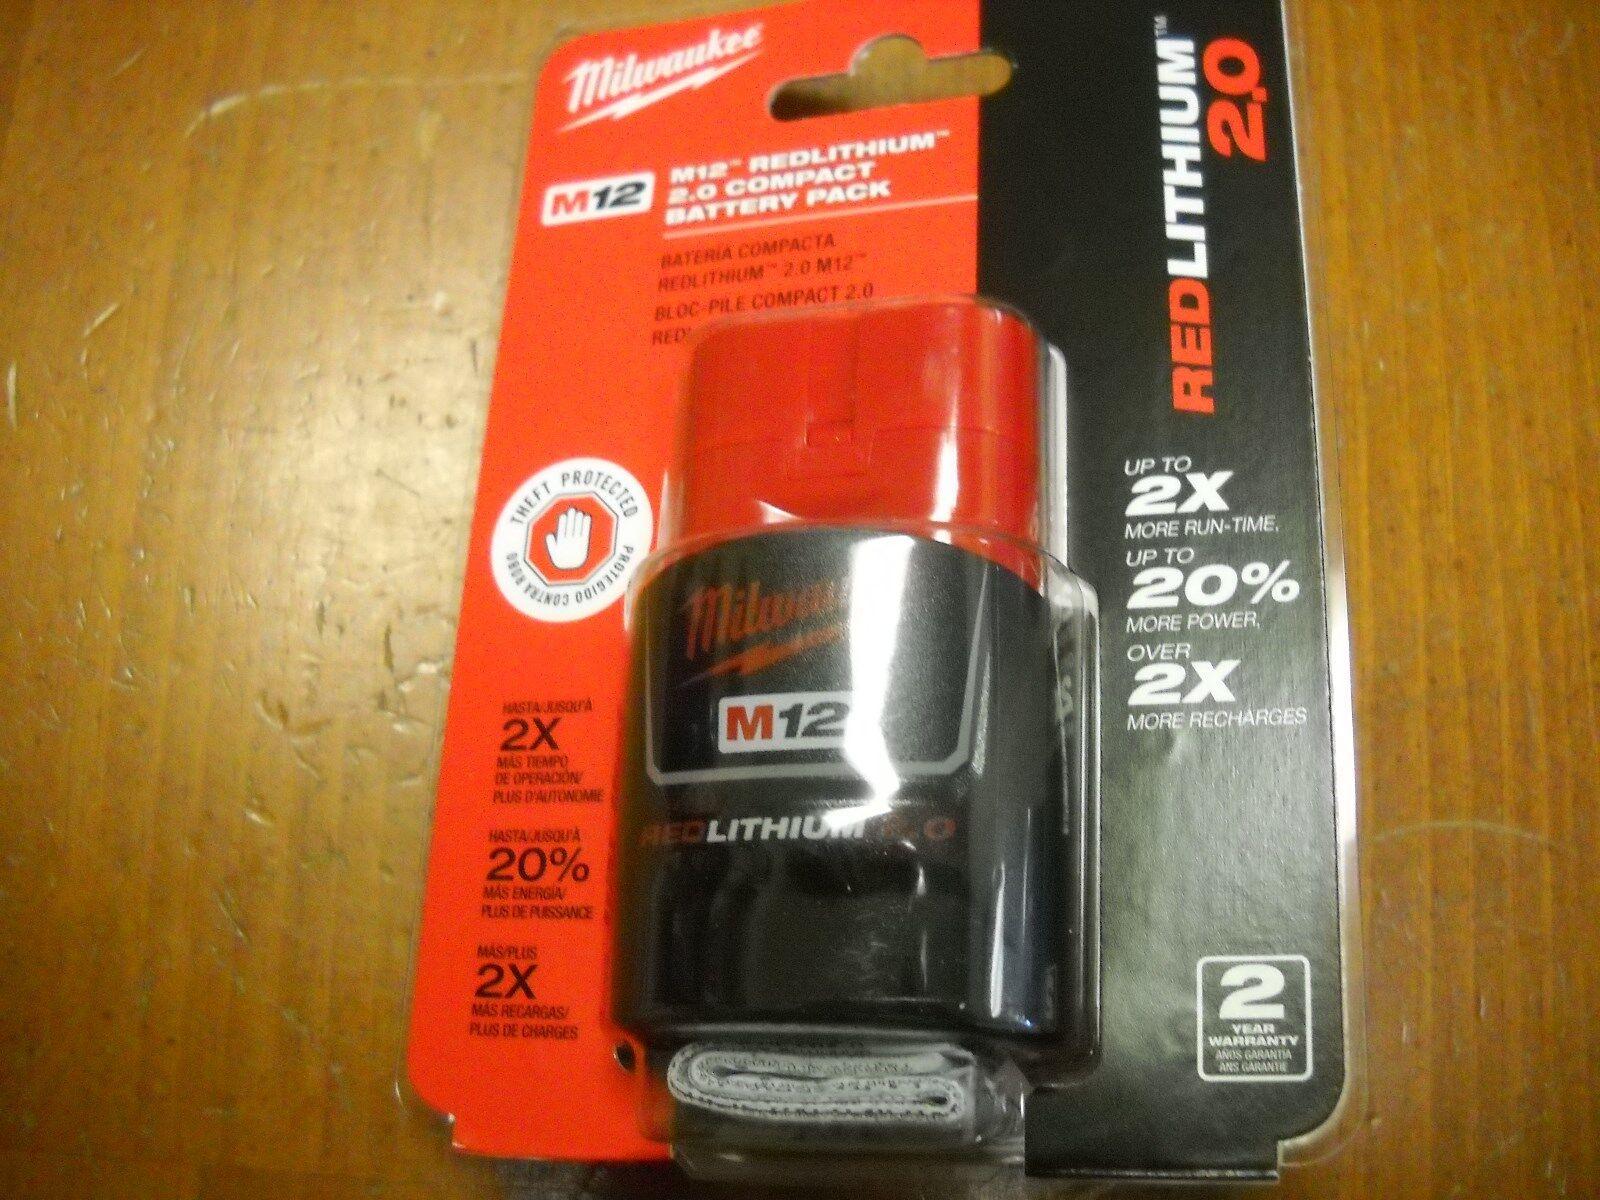 Milwaukee 48-11-2420 M12 12 Volt 2.0Ah Lithium-Ion Compact Battery Pack Li-Ion